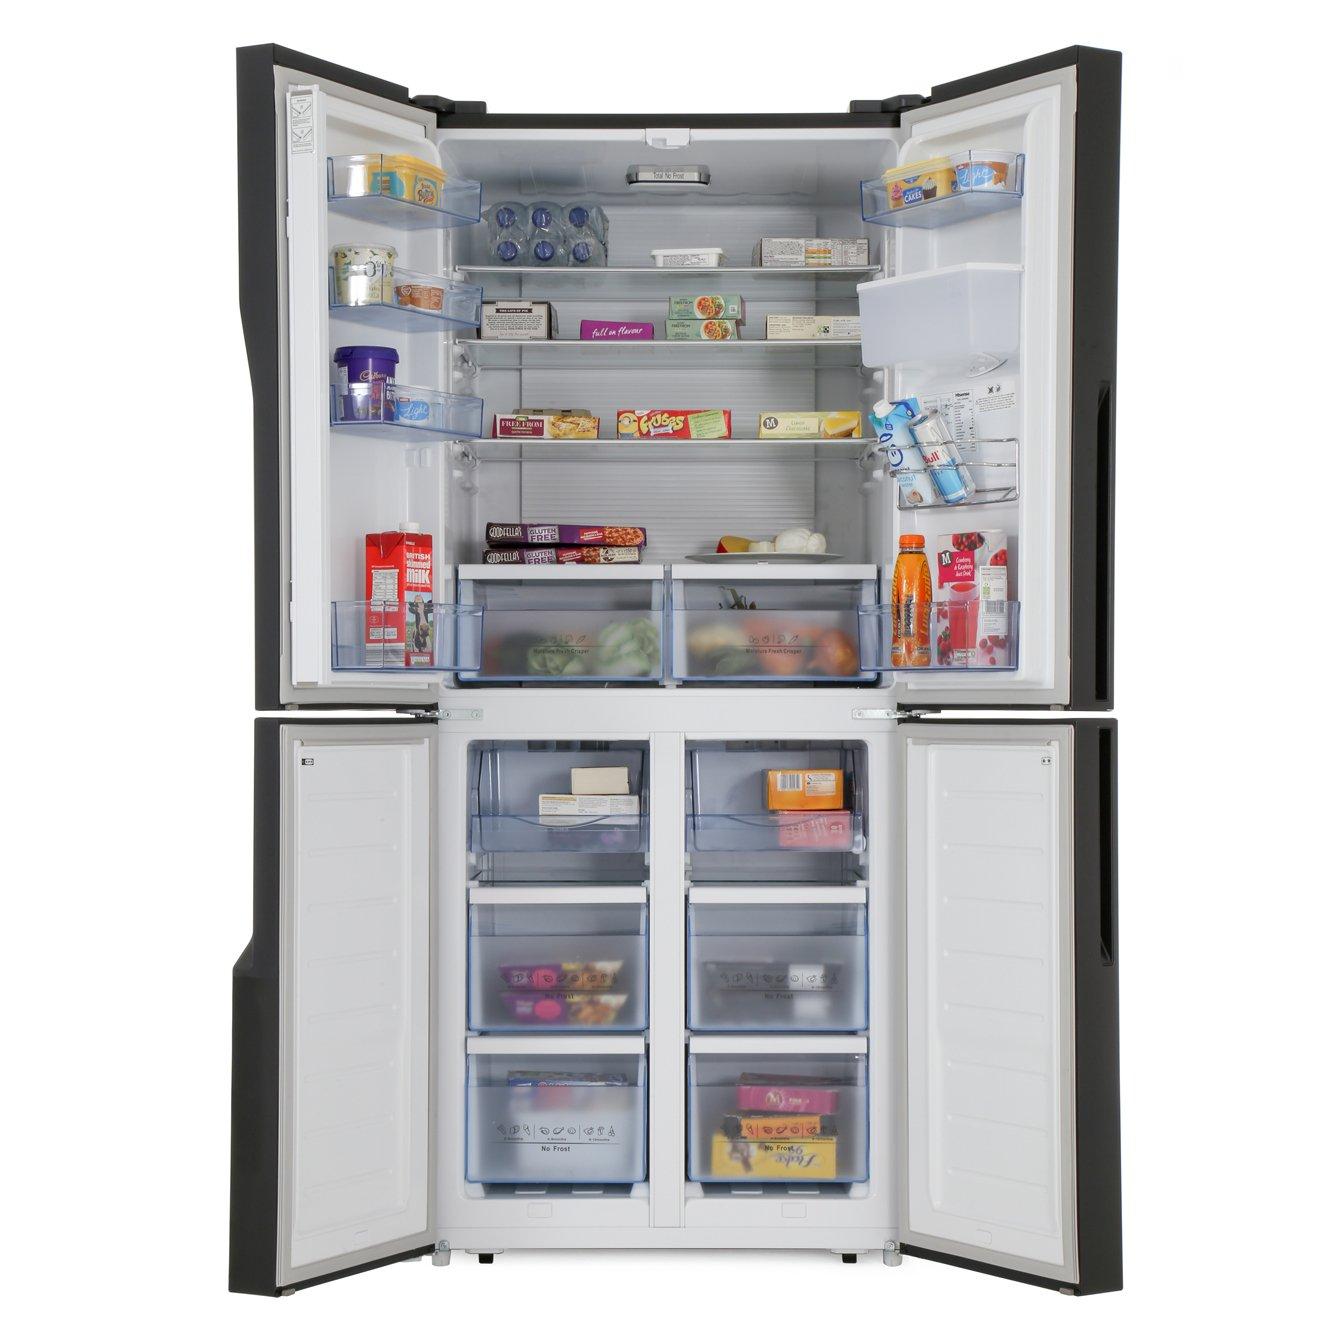 Buy Hisense Rq560n4wb1 American Fridge Freezer Black